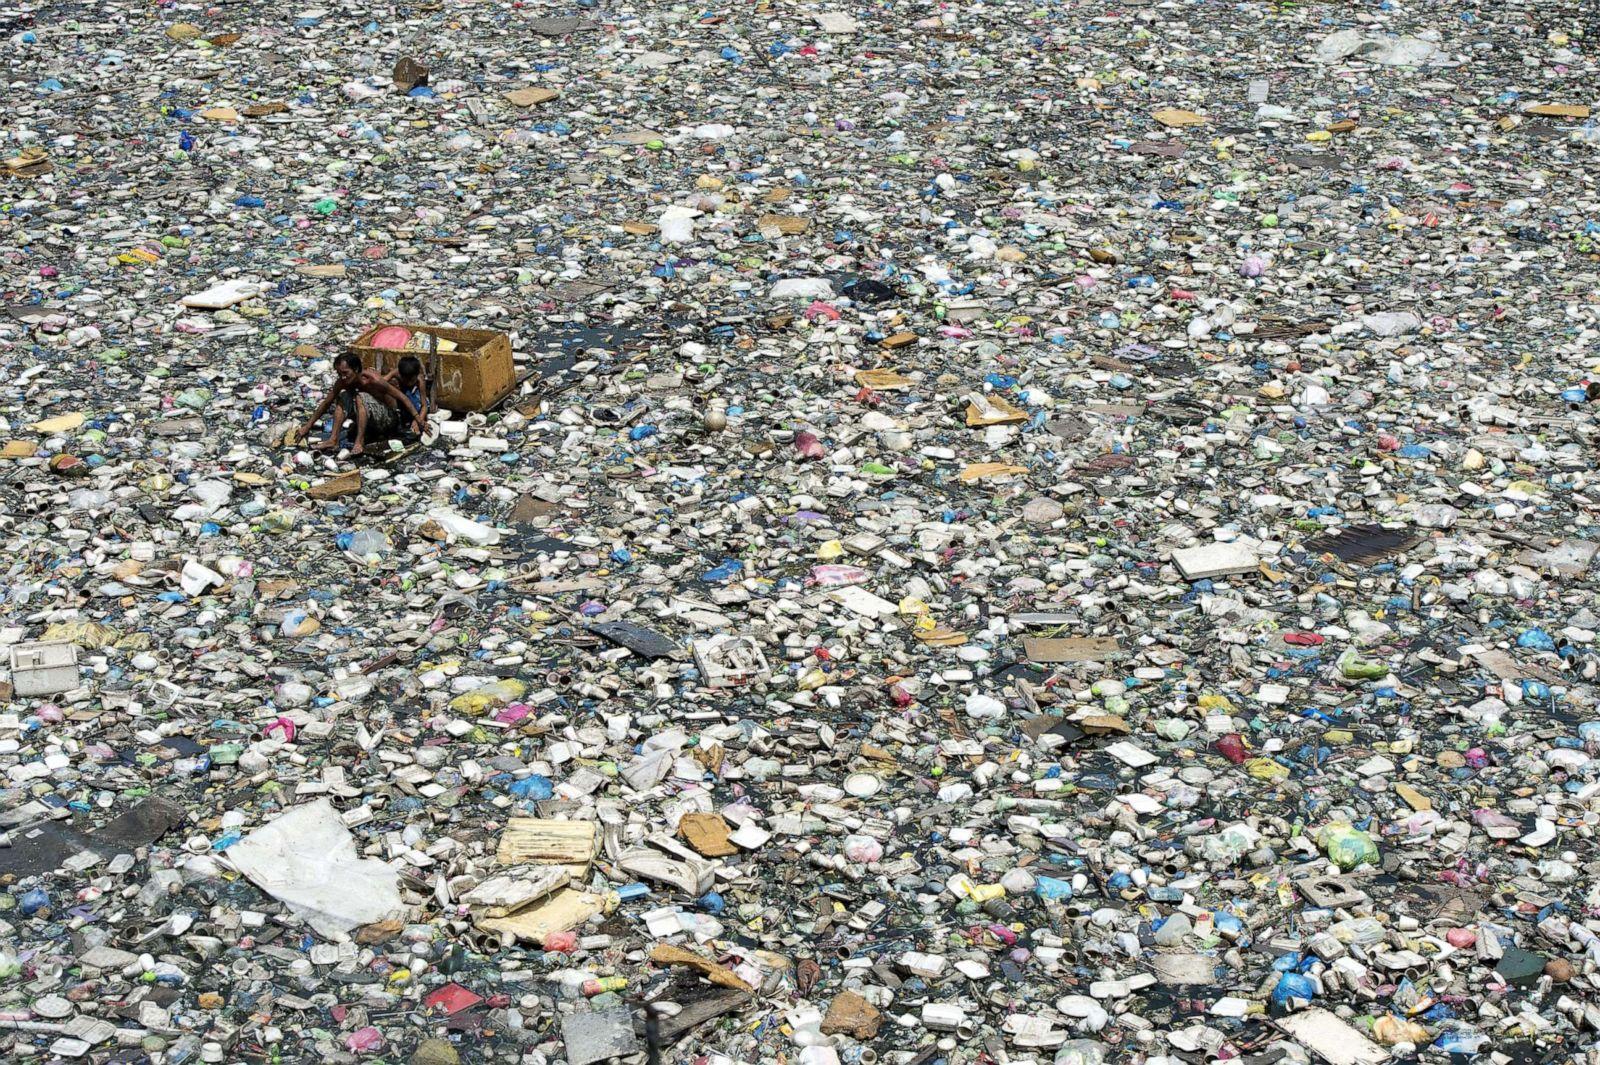 plastic-waste-gty-jpo-190507_hpEmbed_3x2_1600.jpg